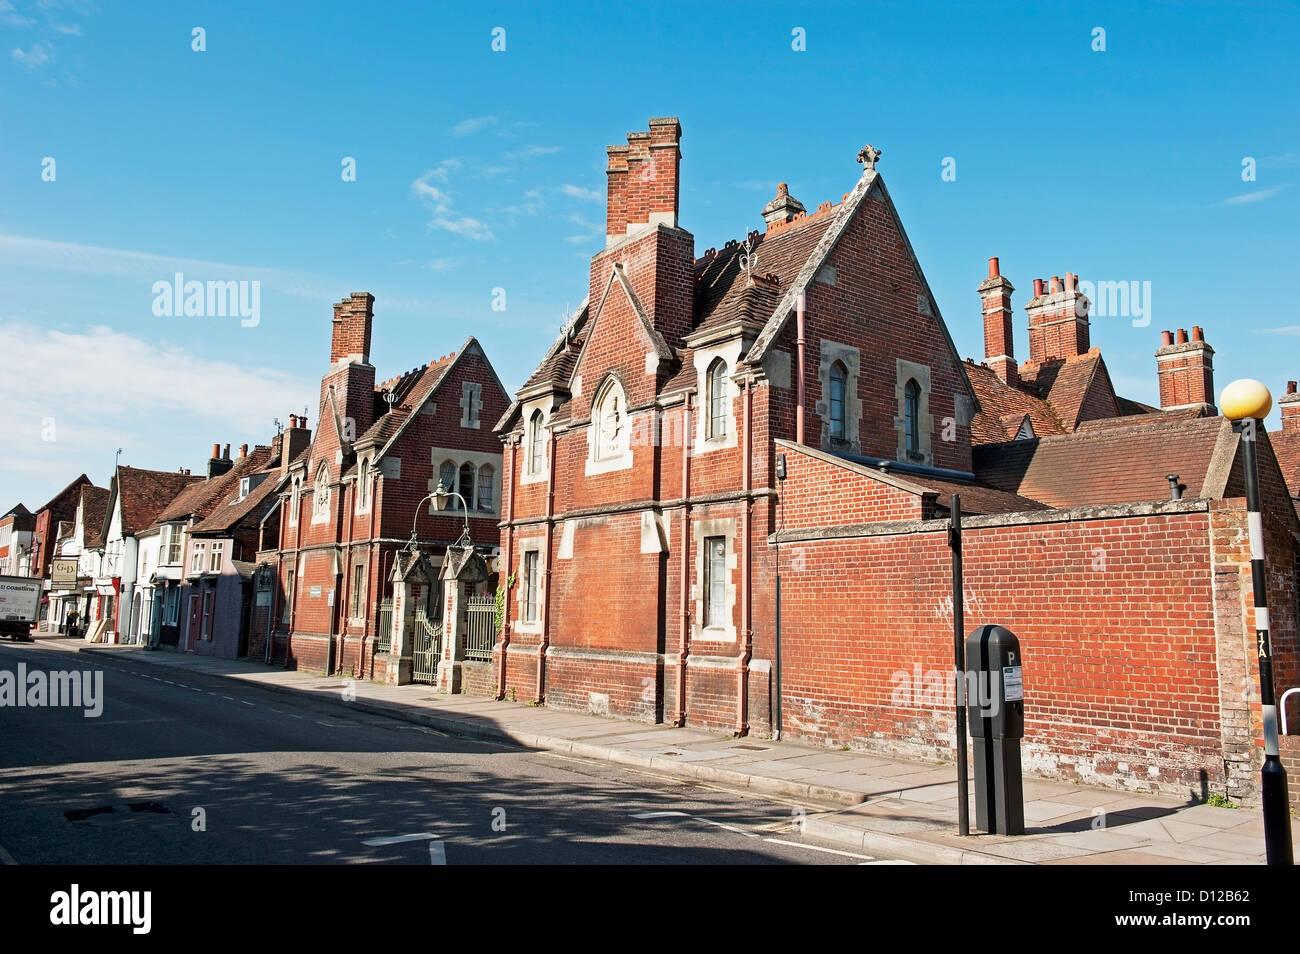 Brick Buildings With Chimneys Along A Street; Salisbury England Stock Photo